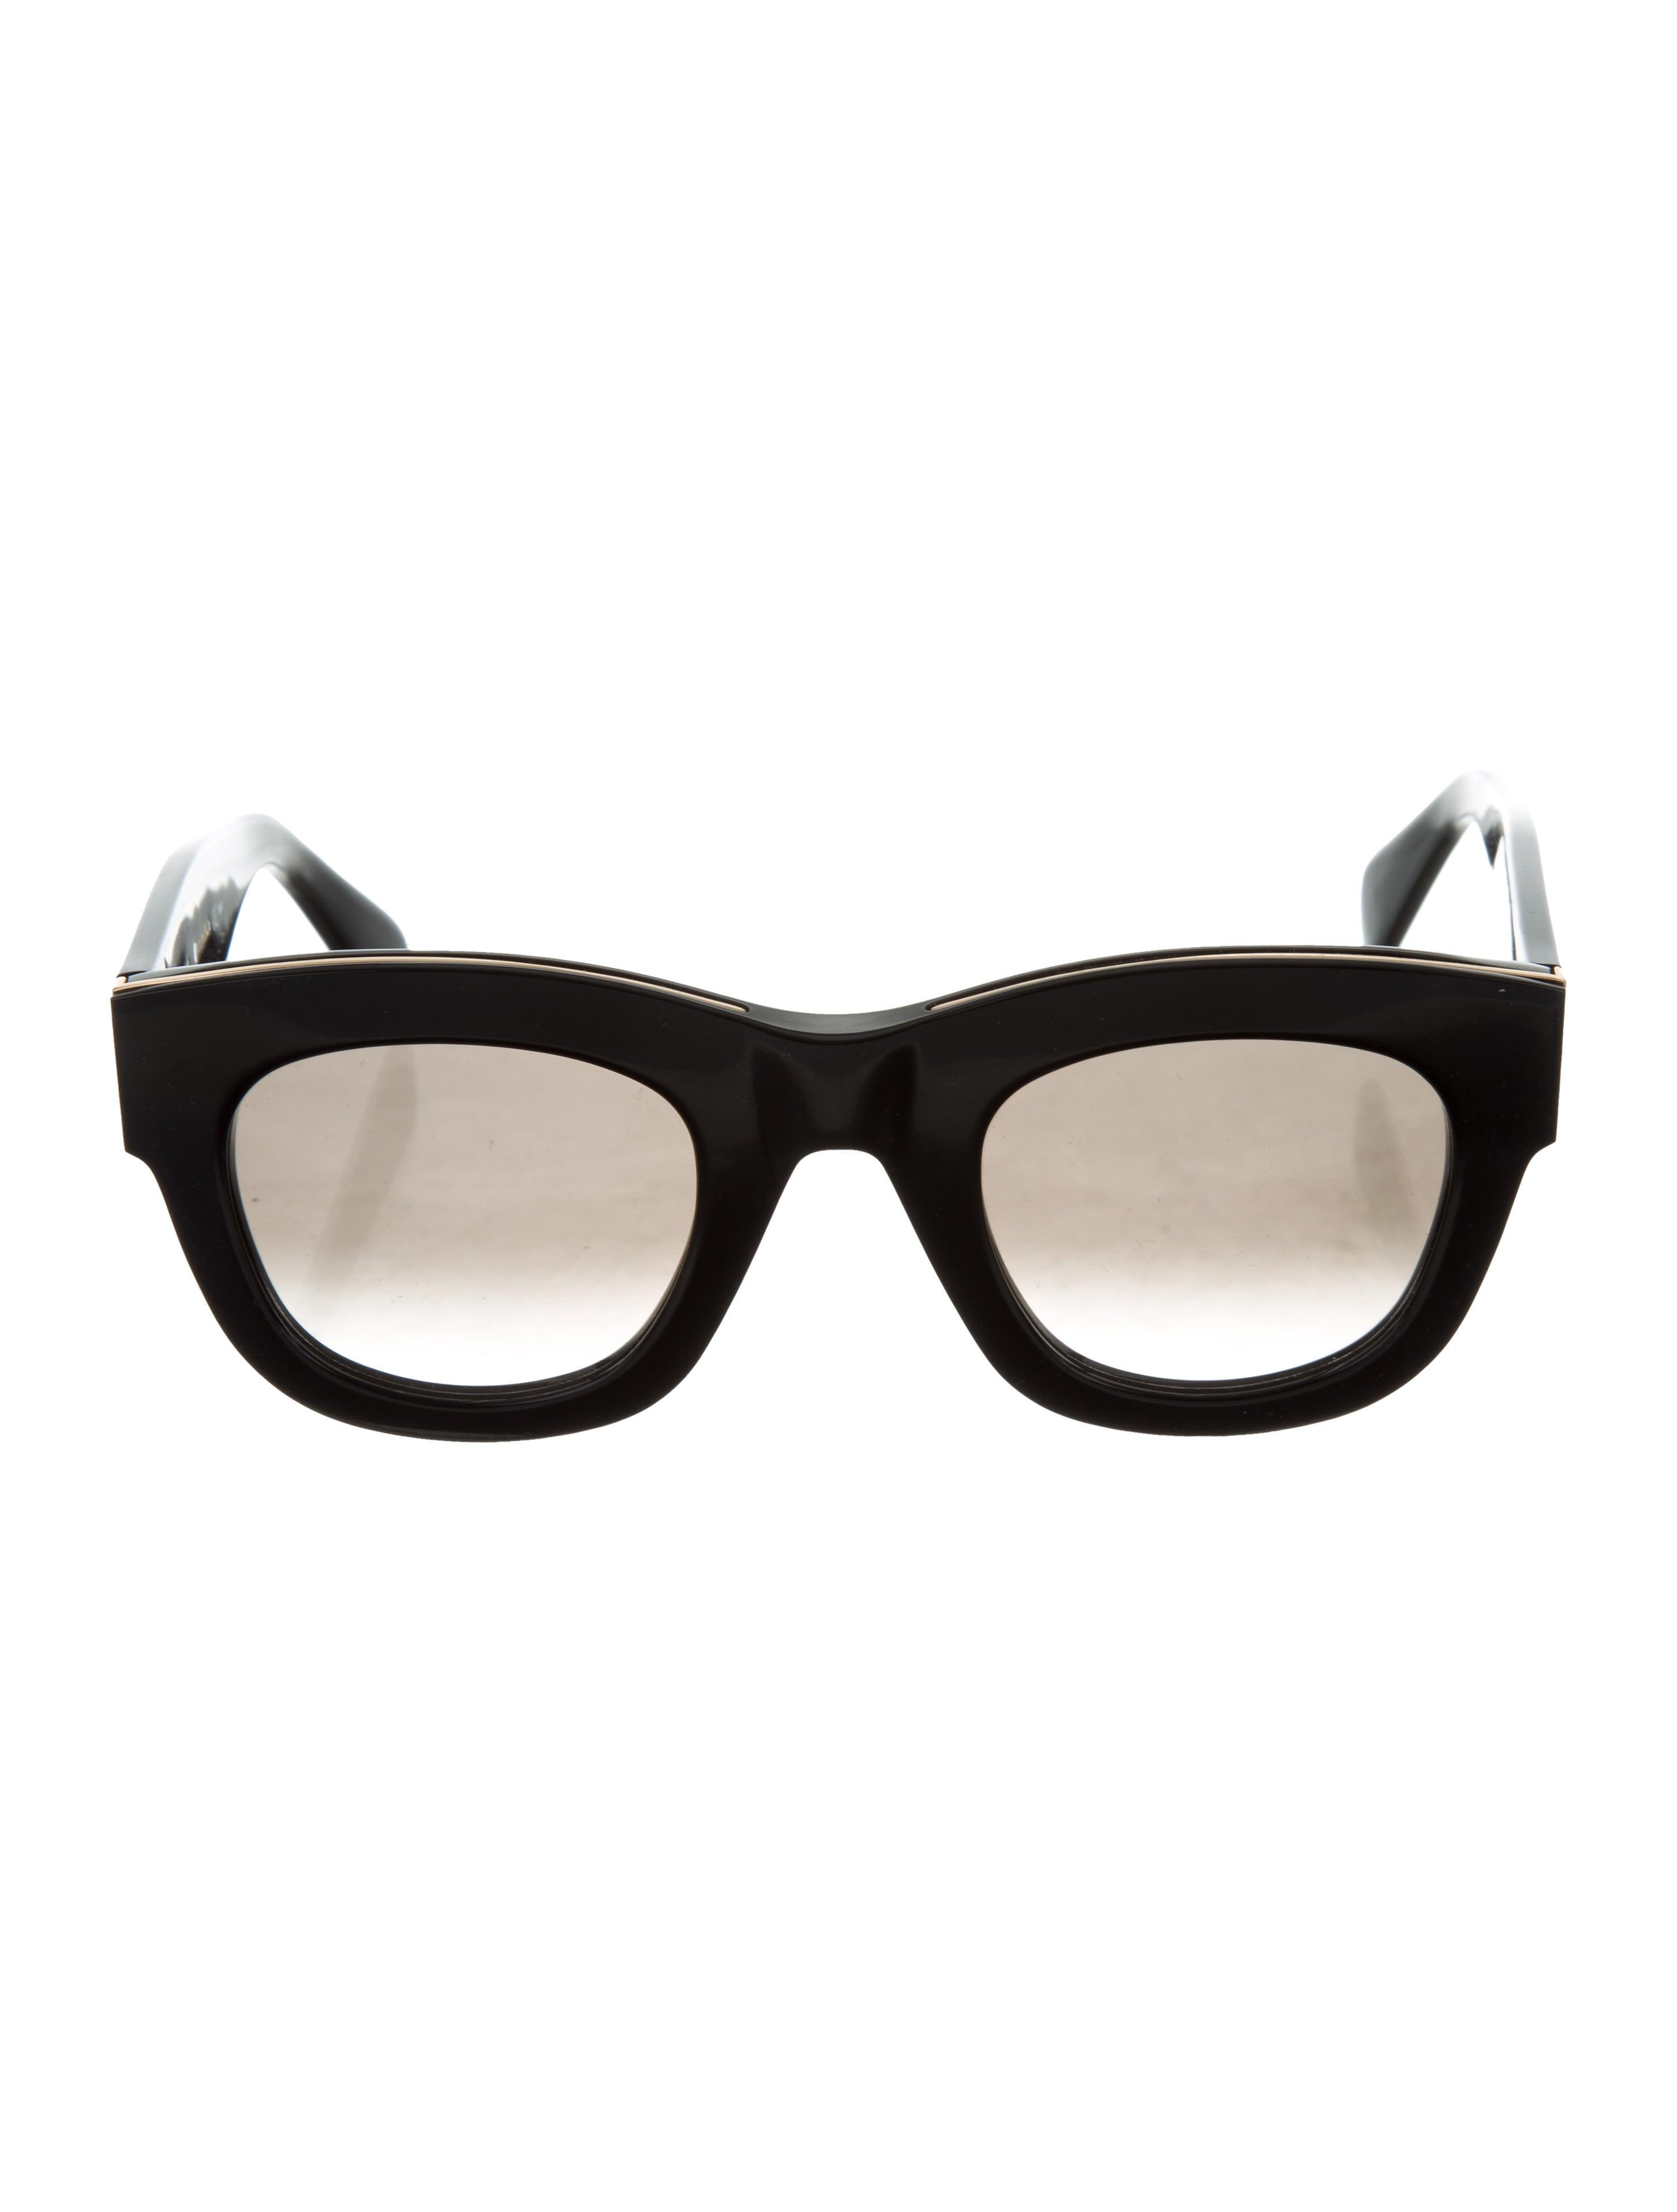 c34a14fb1bd Céline Strat Brow Sunglasses - Accessories - CEL61407